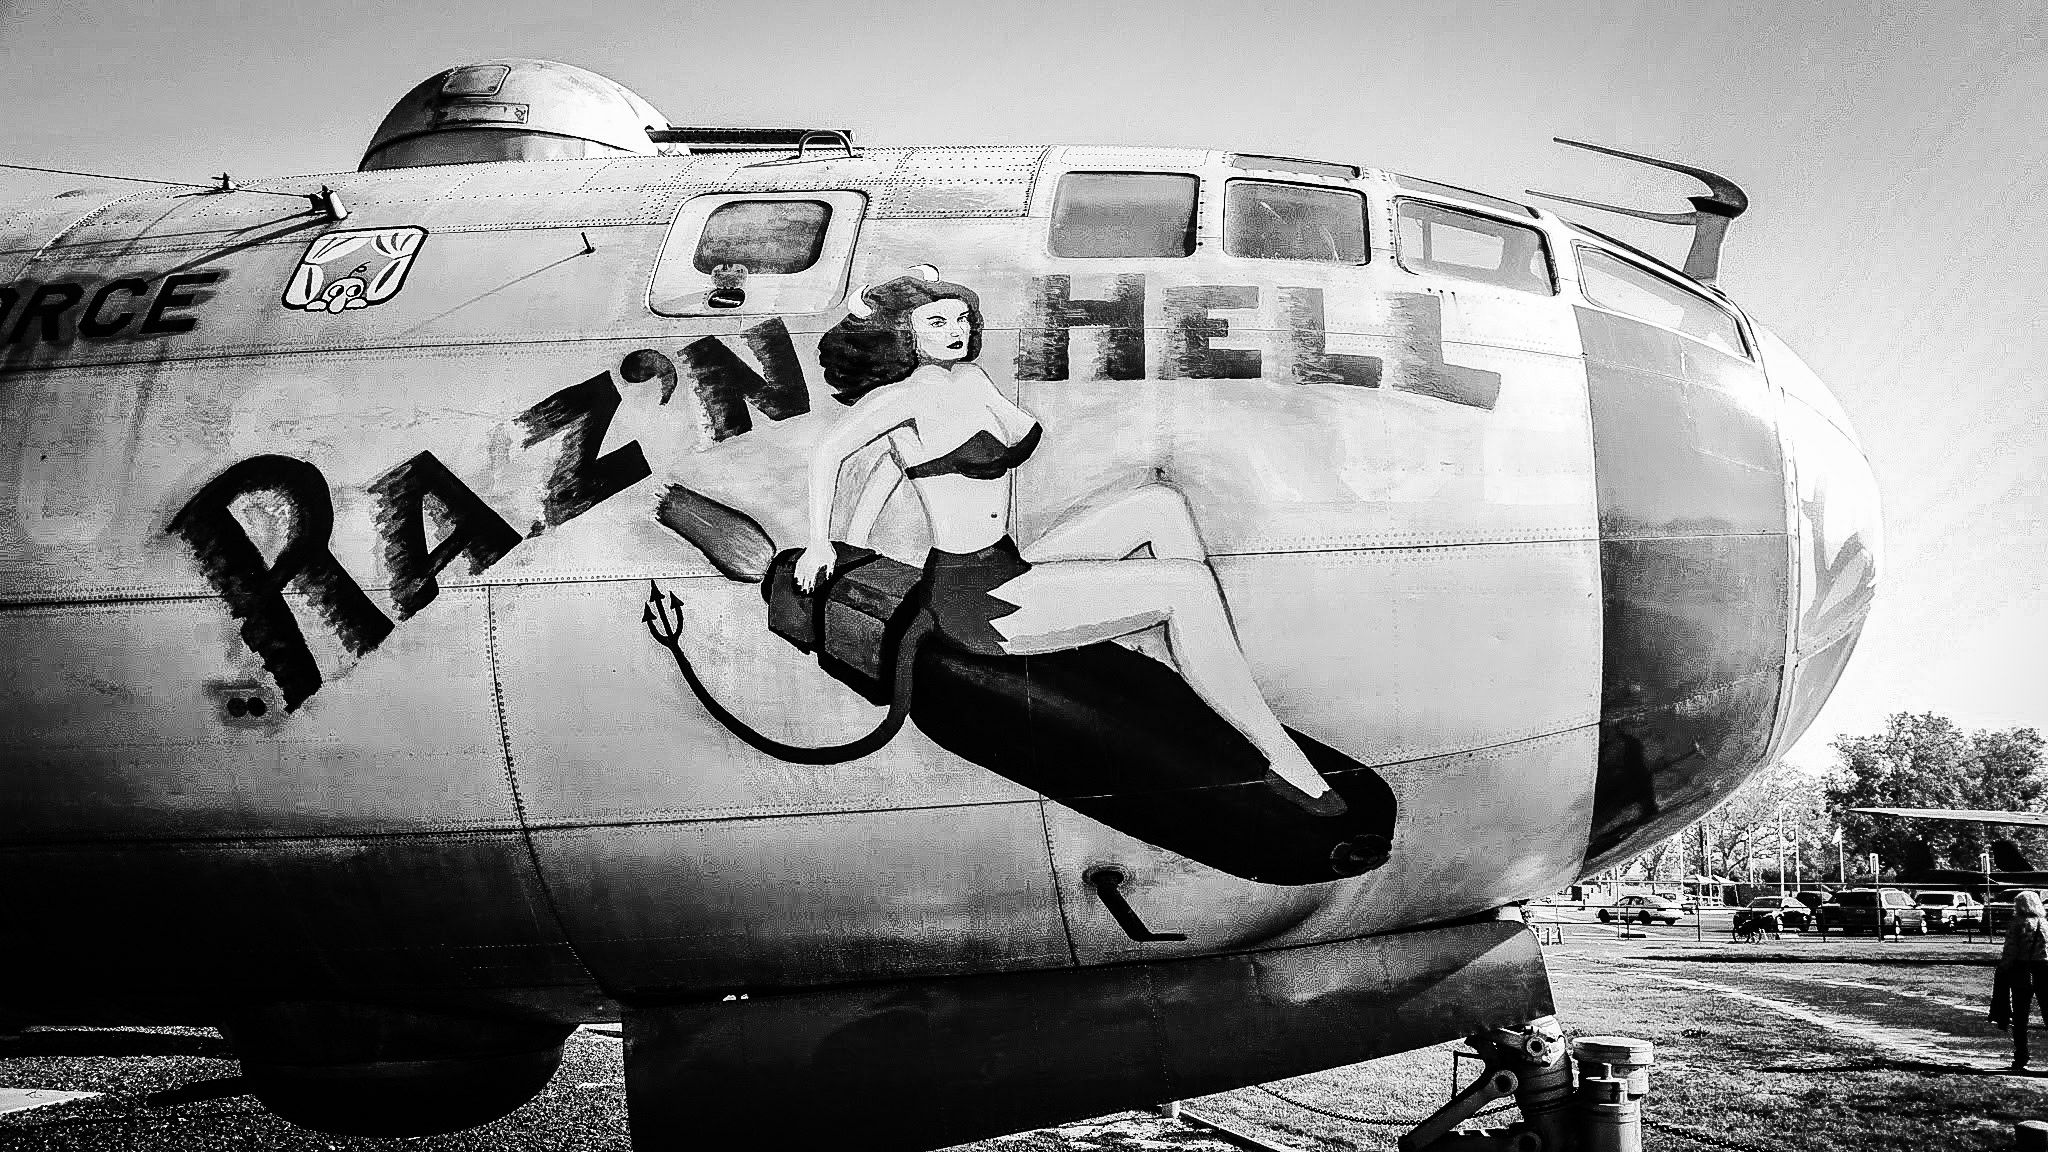 Pin on Aircraft Photography